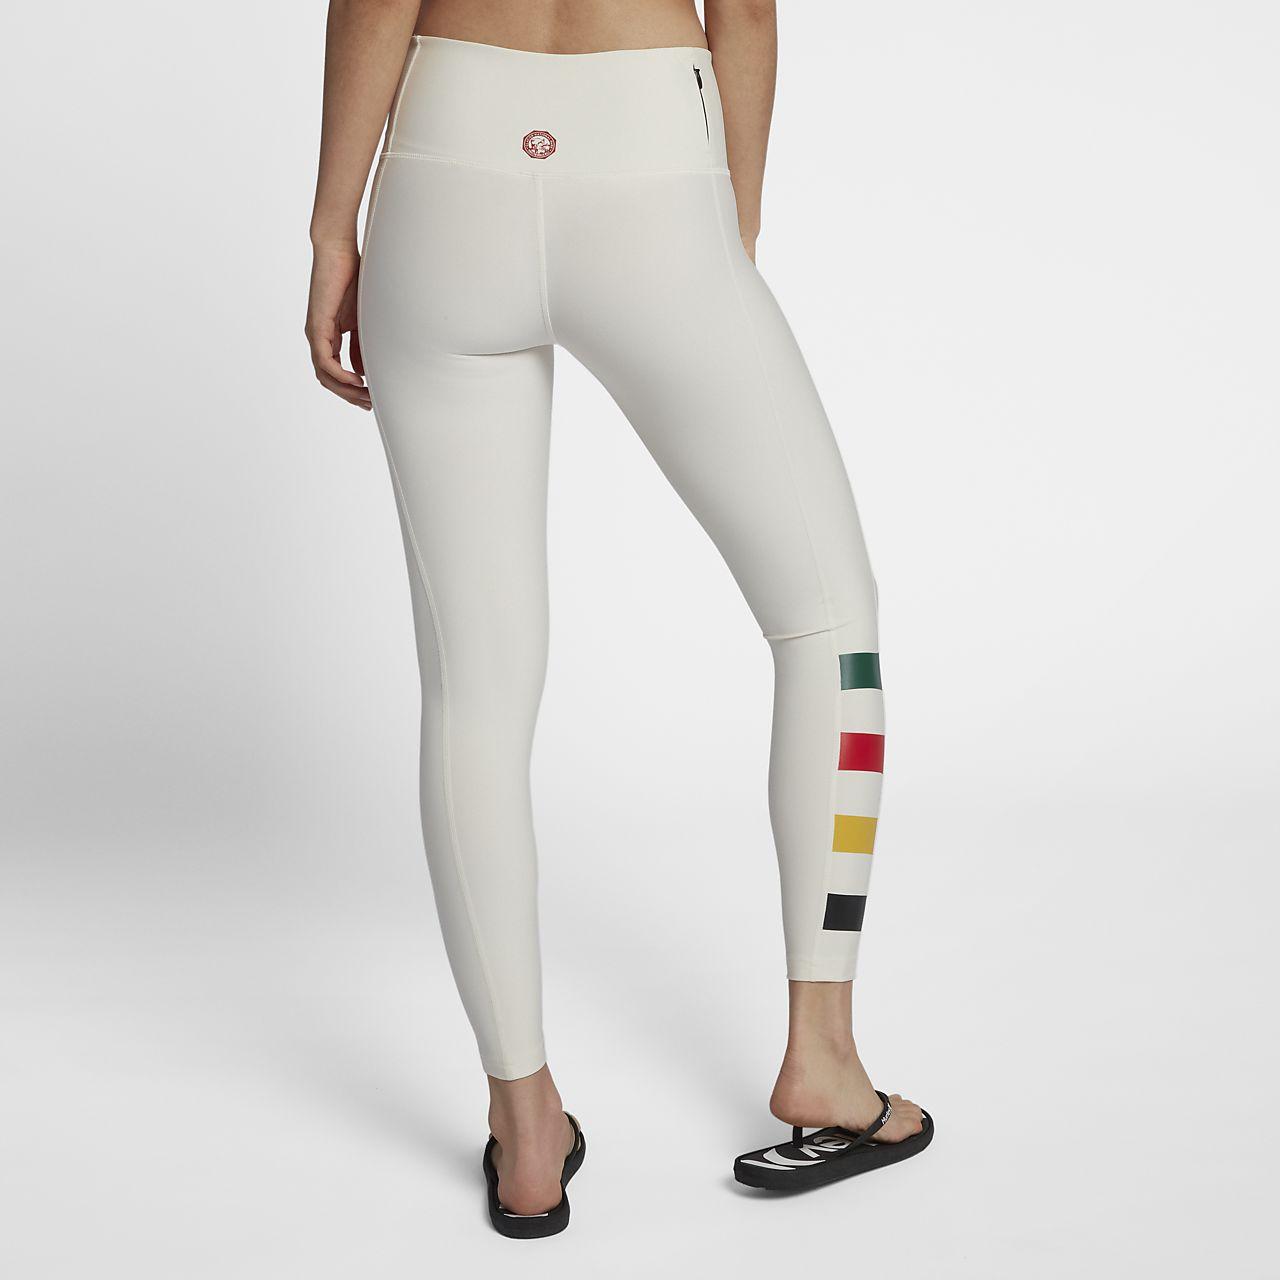 680dc5a7f572d8 Hurley Quick Dry Pendleton Glacier Women's Leggings. Nike.com CA